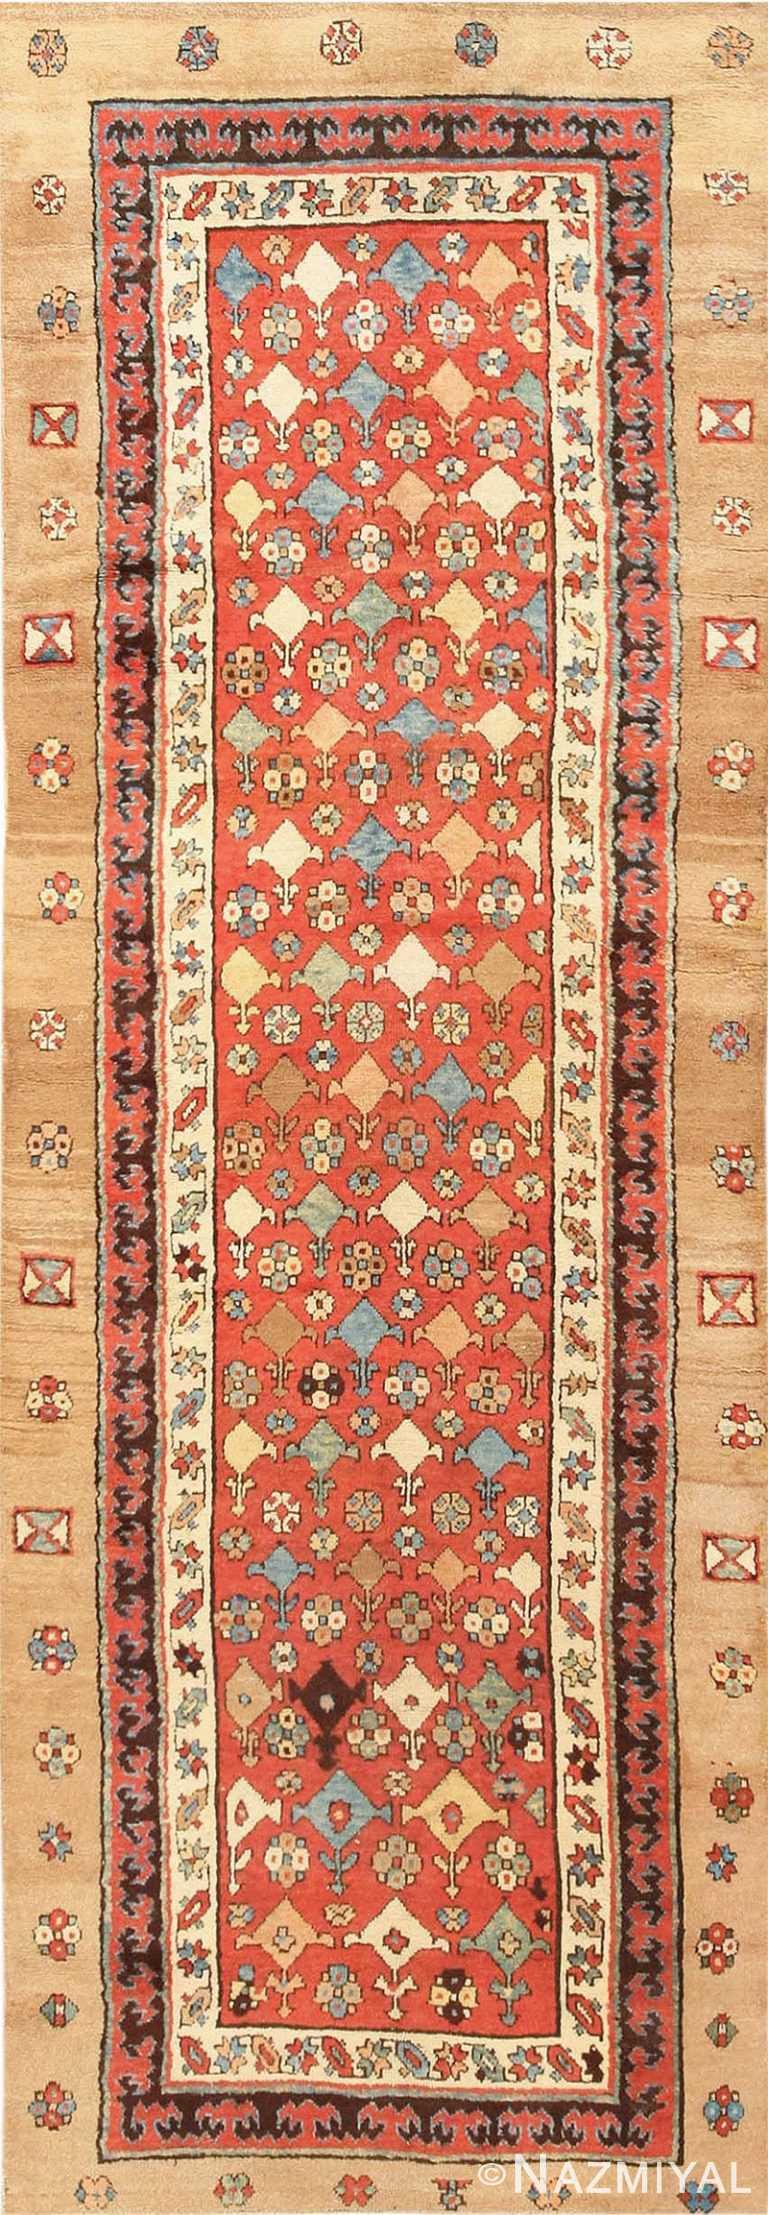 Small Tribal Antique Persian Bakshaish Rug #42827 by Nazmiyal Antique Rugs